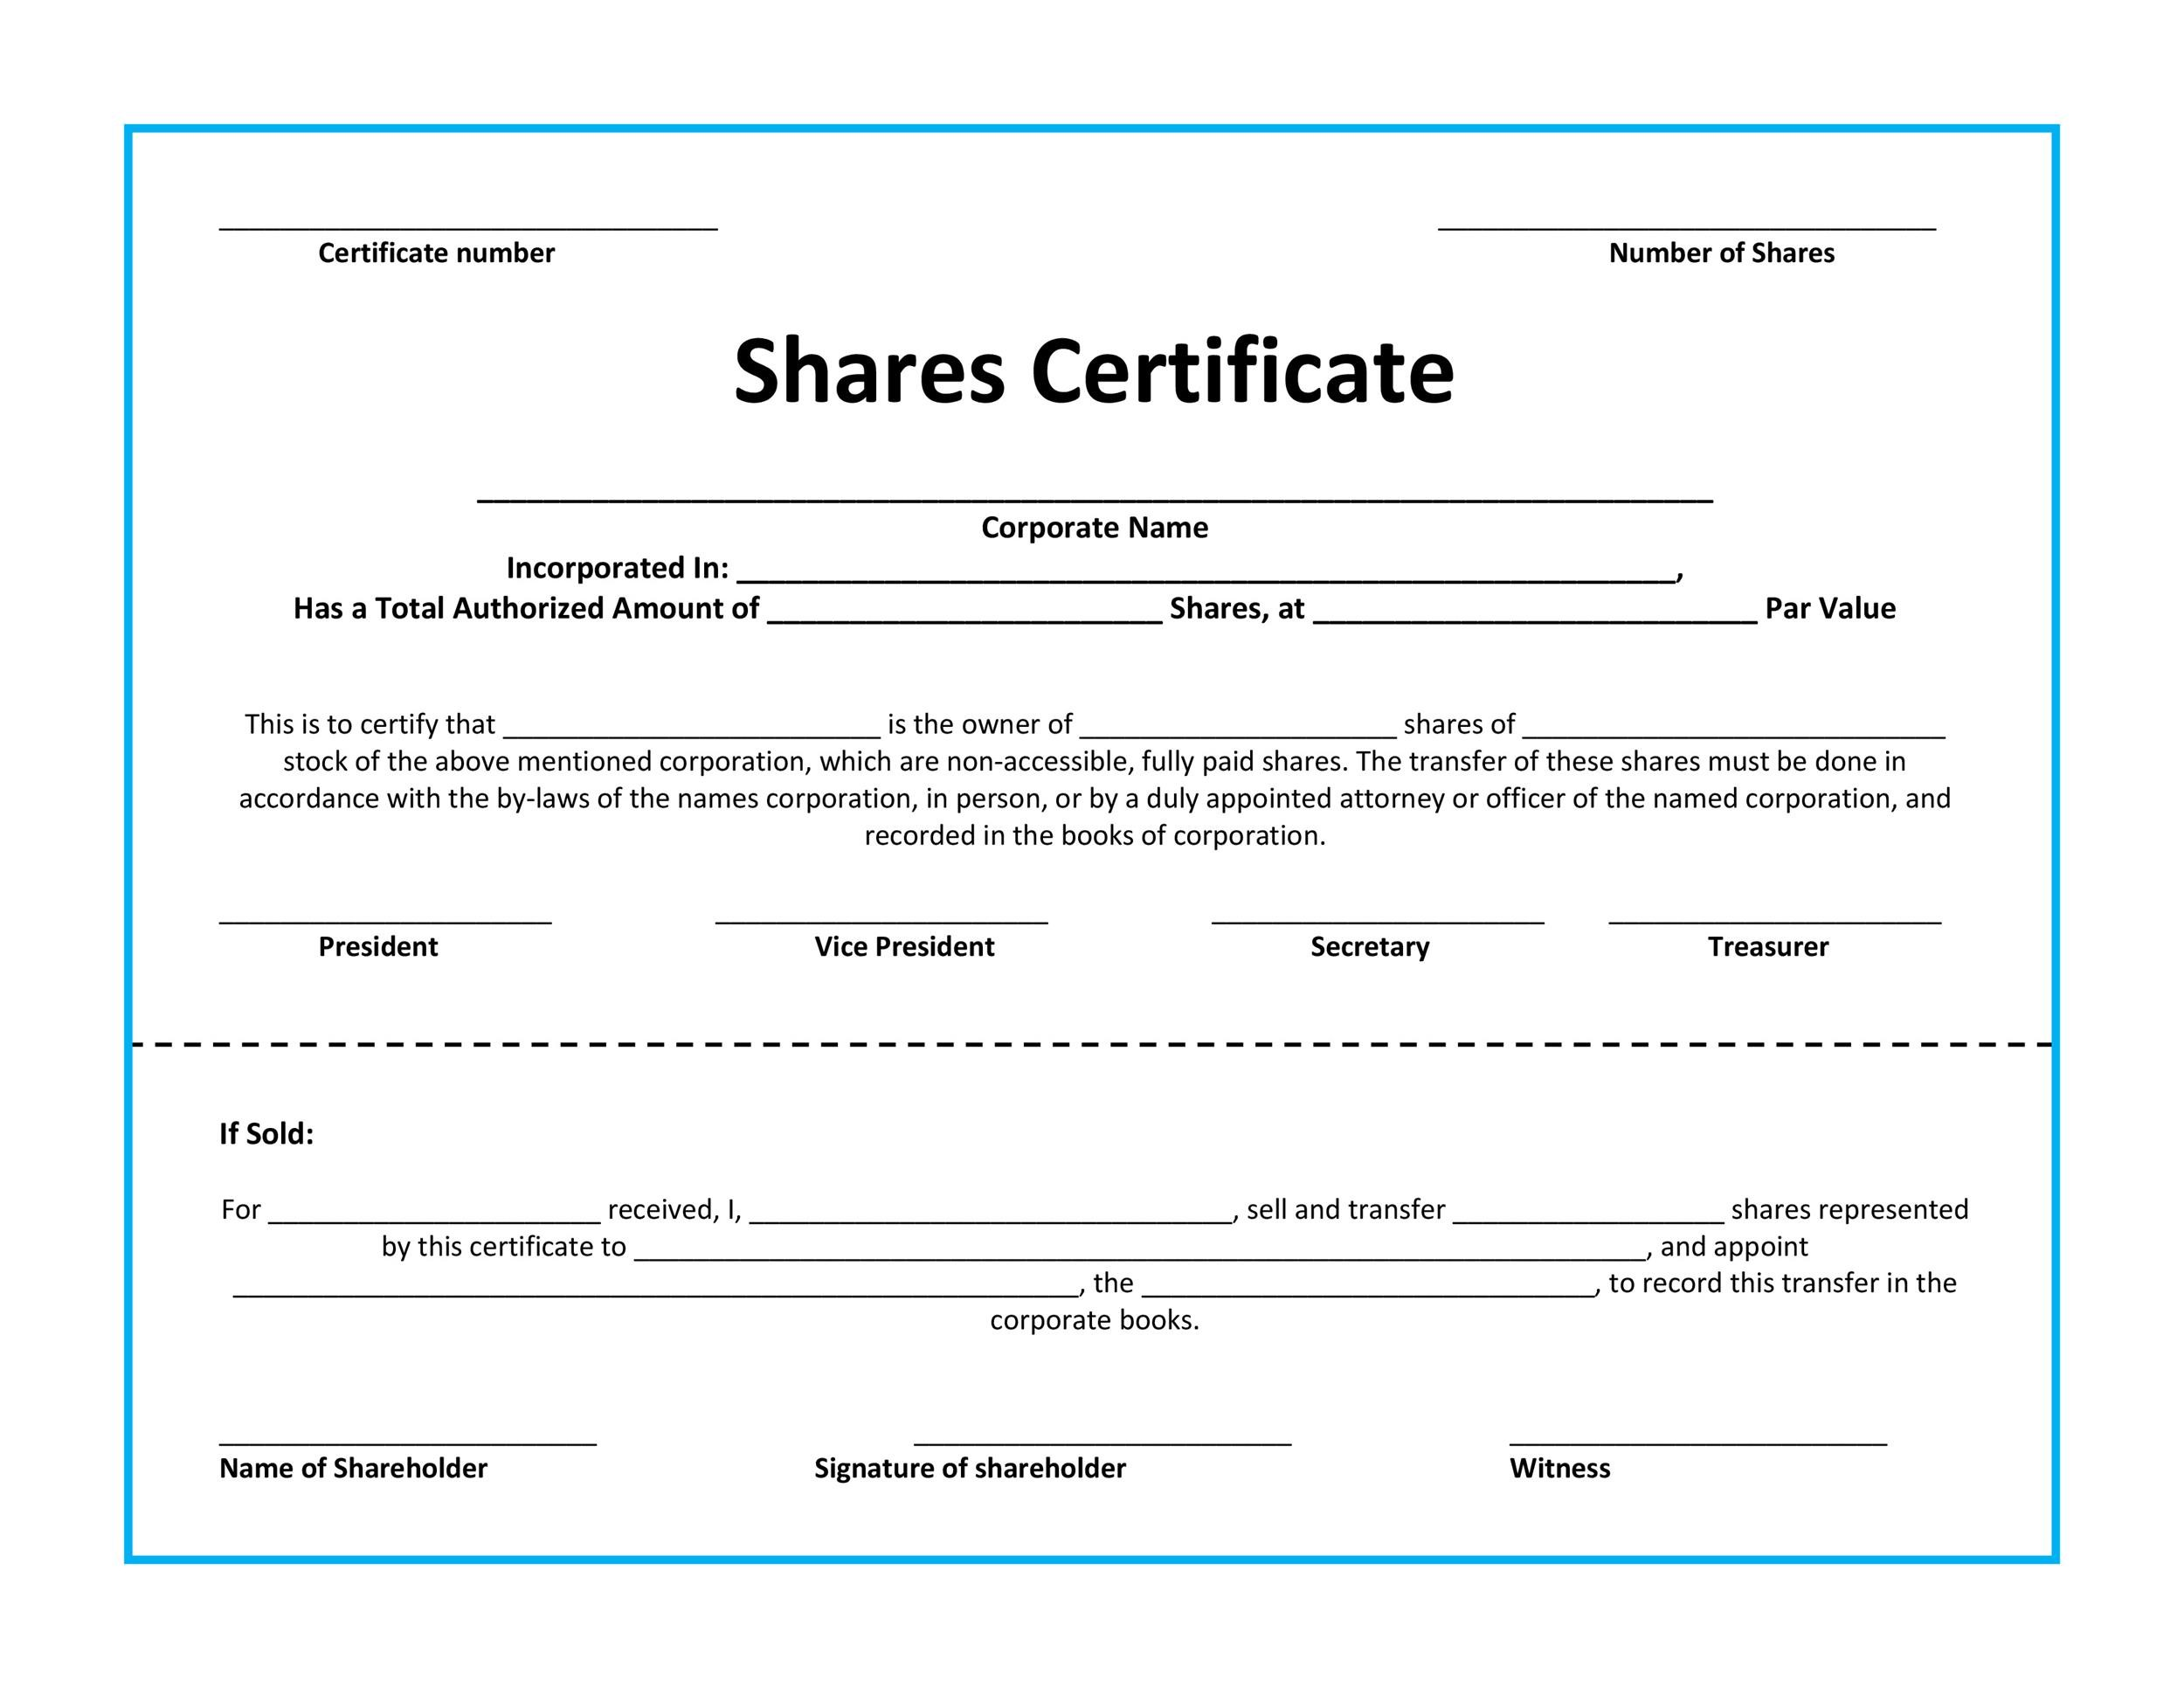 40+ Free Stock Certificate Templates (Word, PDF) - Template Lab - corporate certificate template